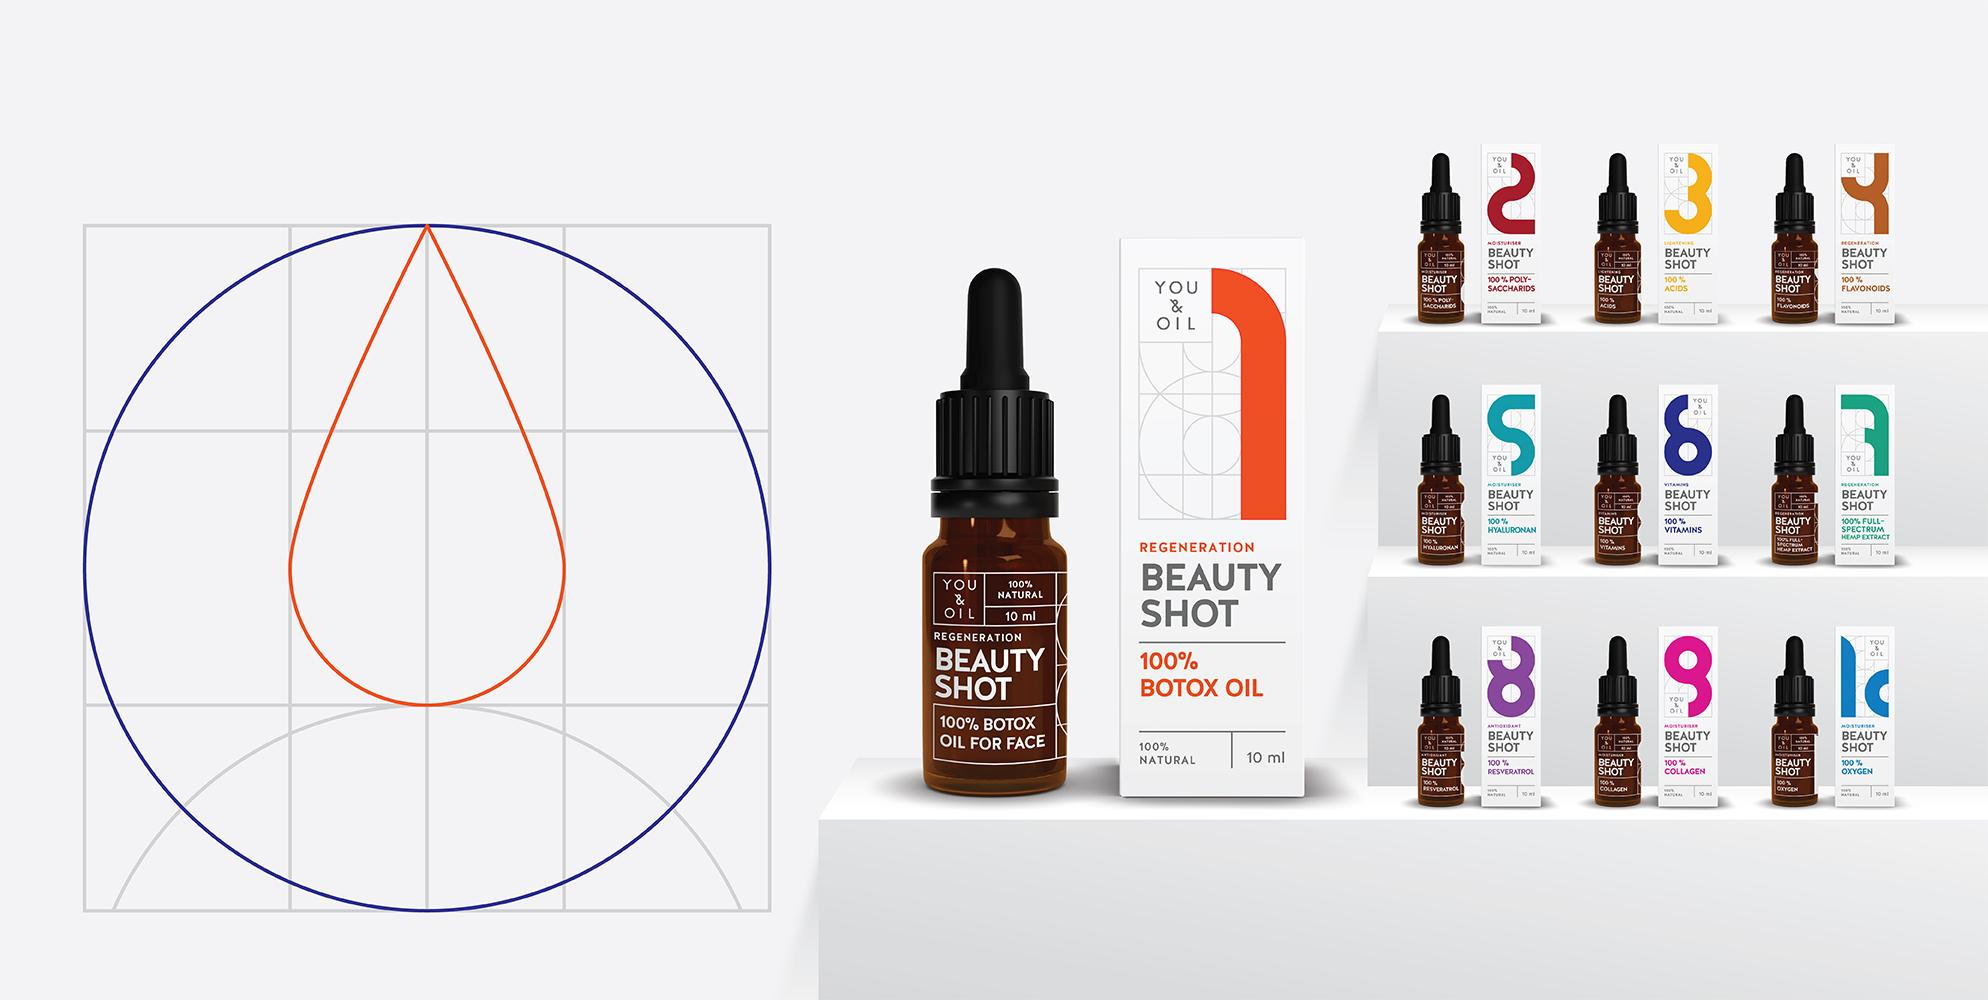 Beauty shot line – You & Oil